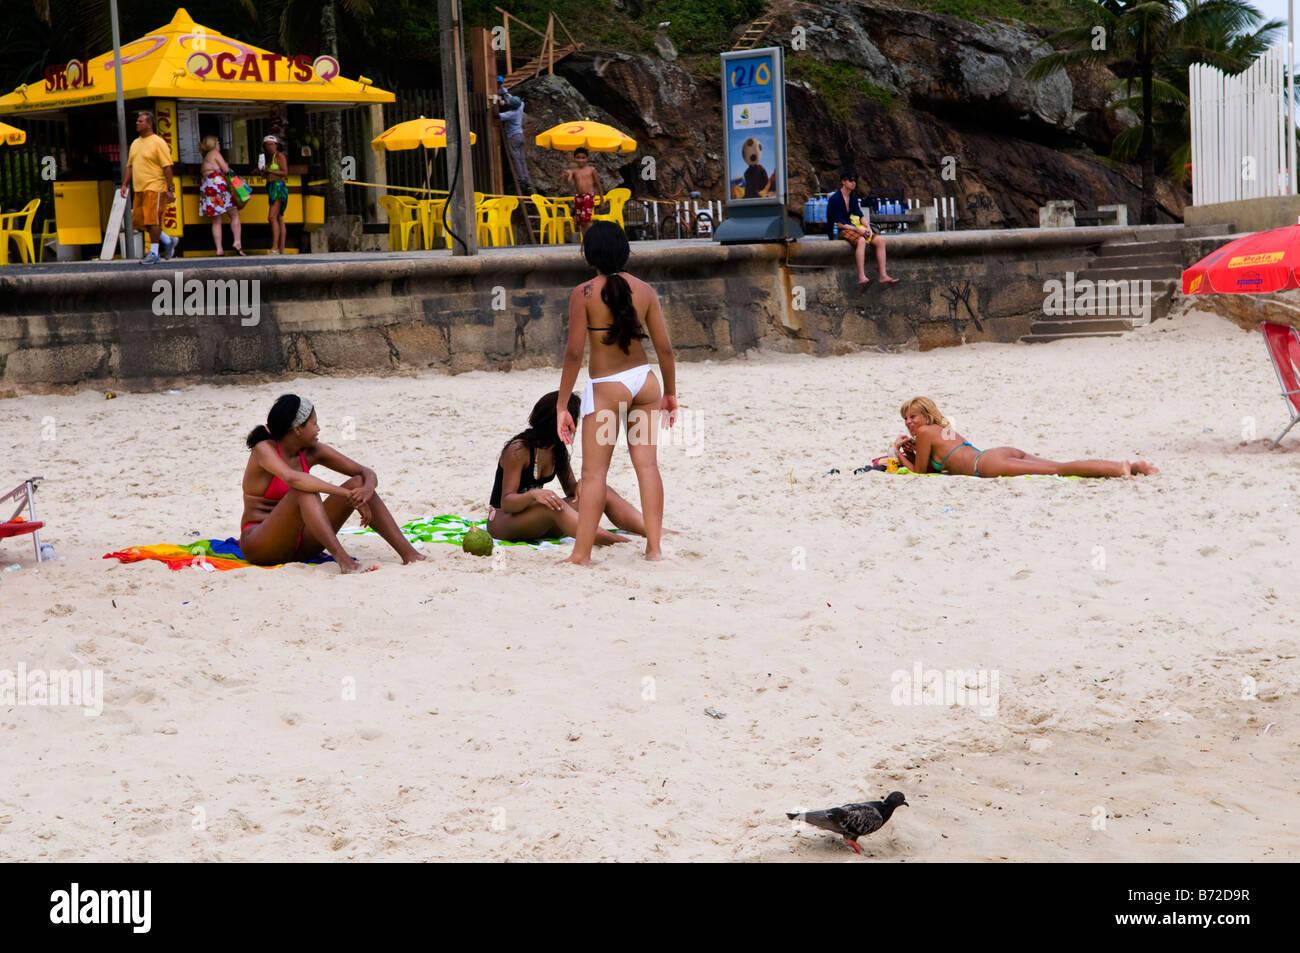 brazilian beauties on ipanema beach stock photo, royalty free image